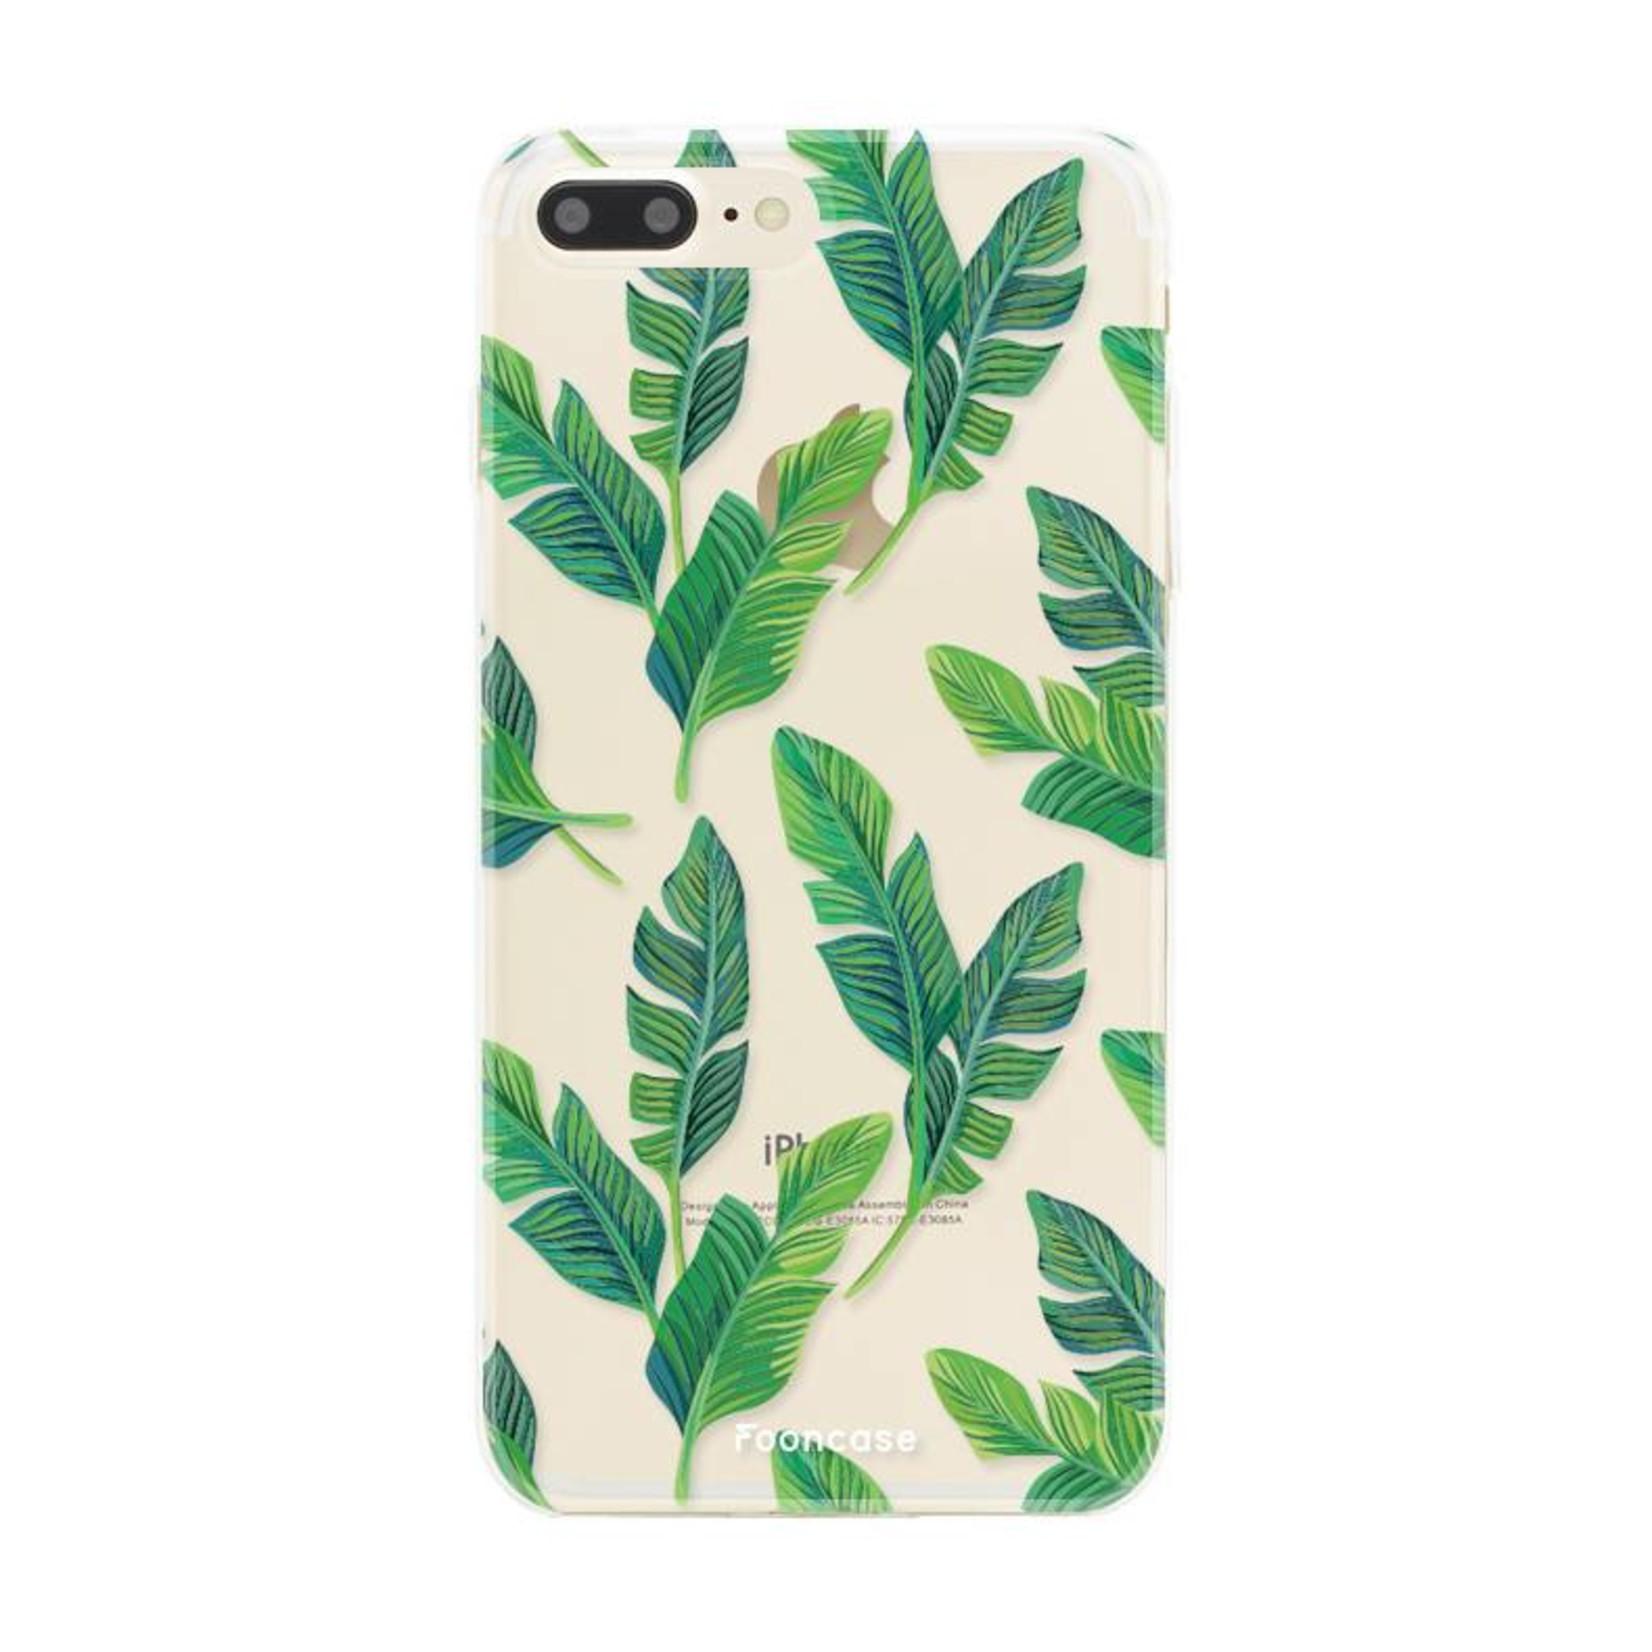 FOONCASE iPhone 8 Plus hoesje TPU Soft Case - Back Cover - Banana leaves / Bananen bladeren